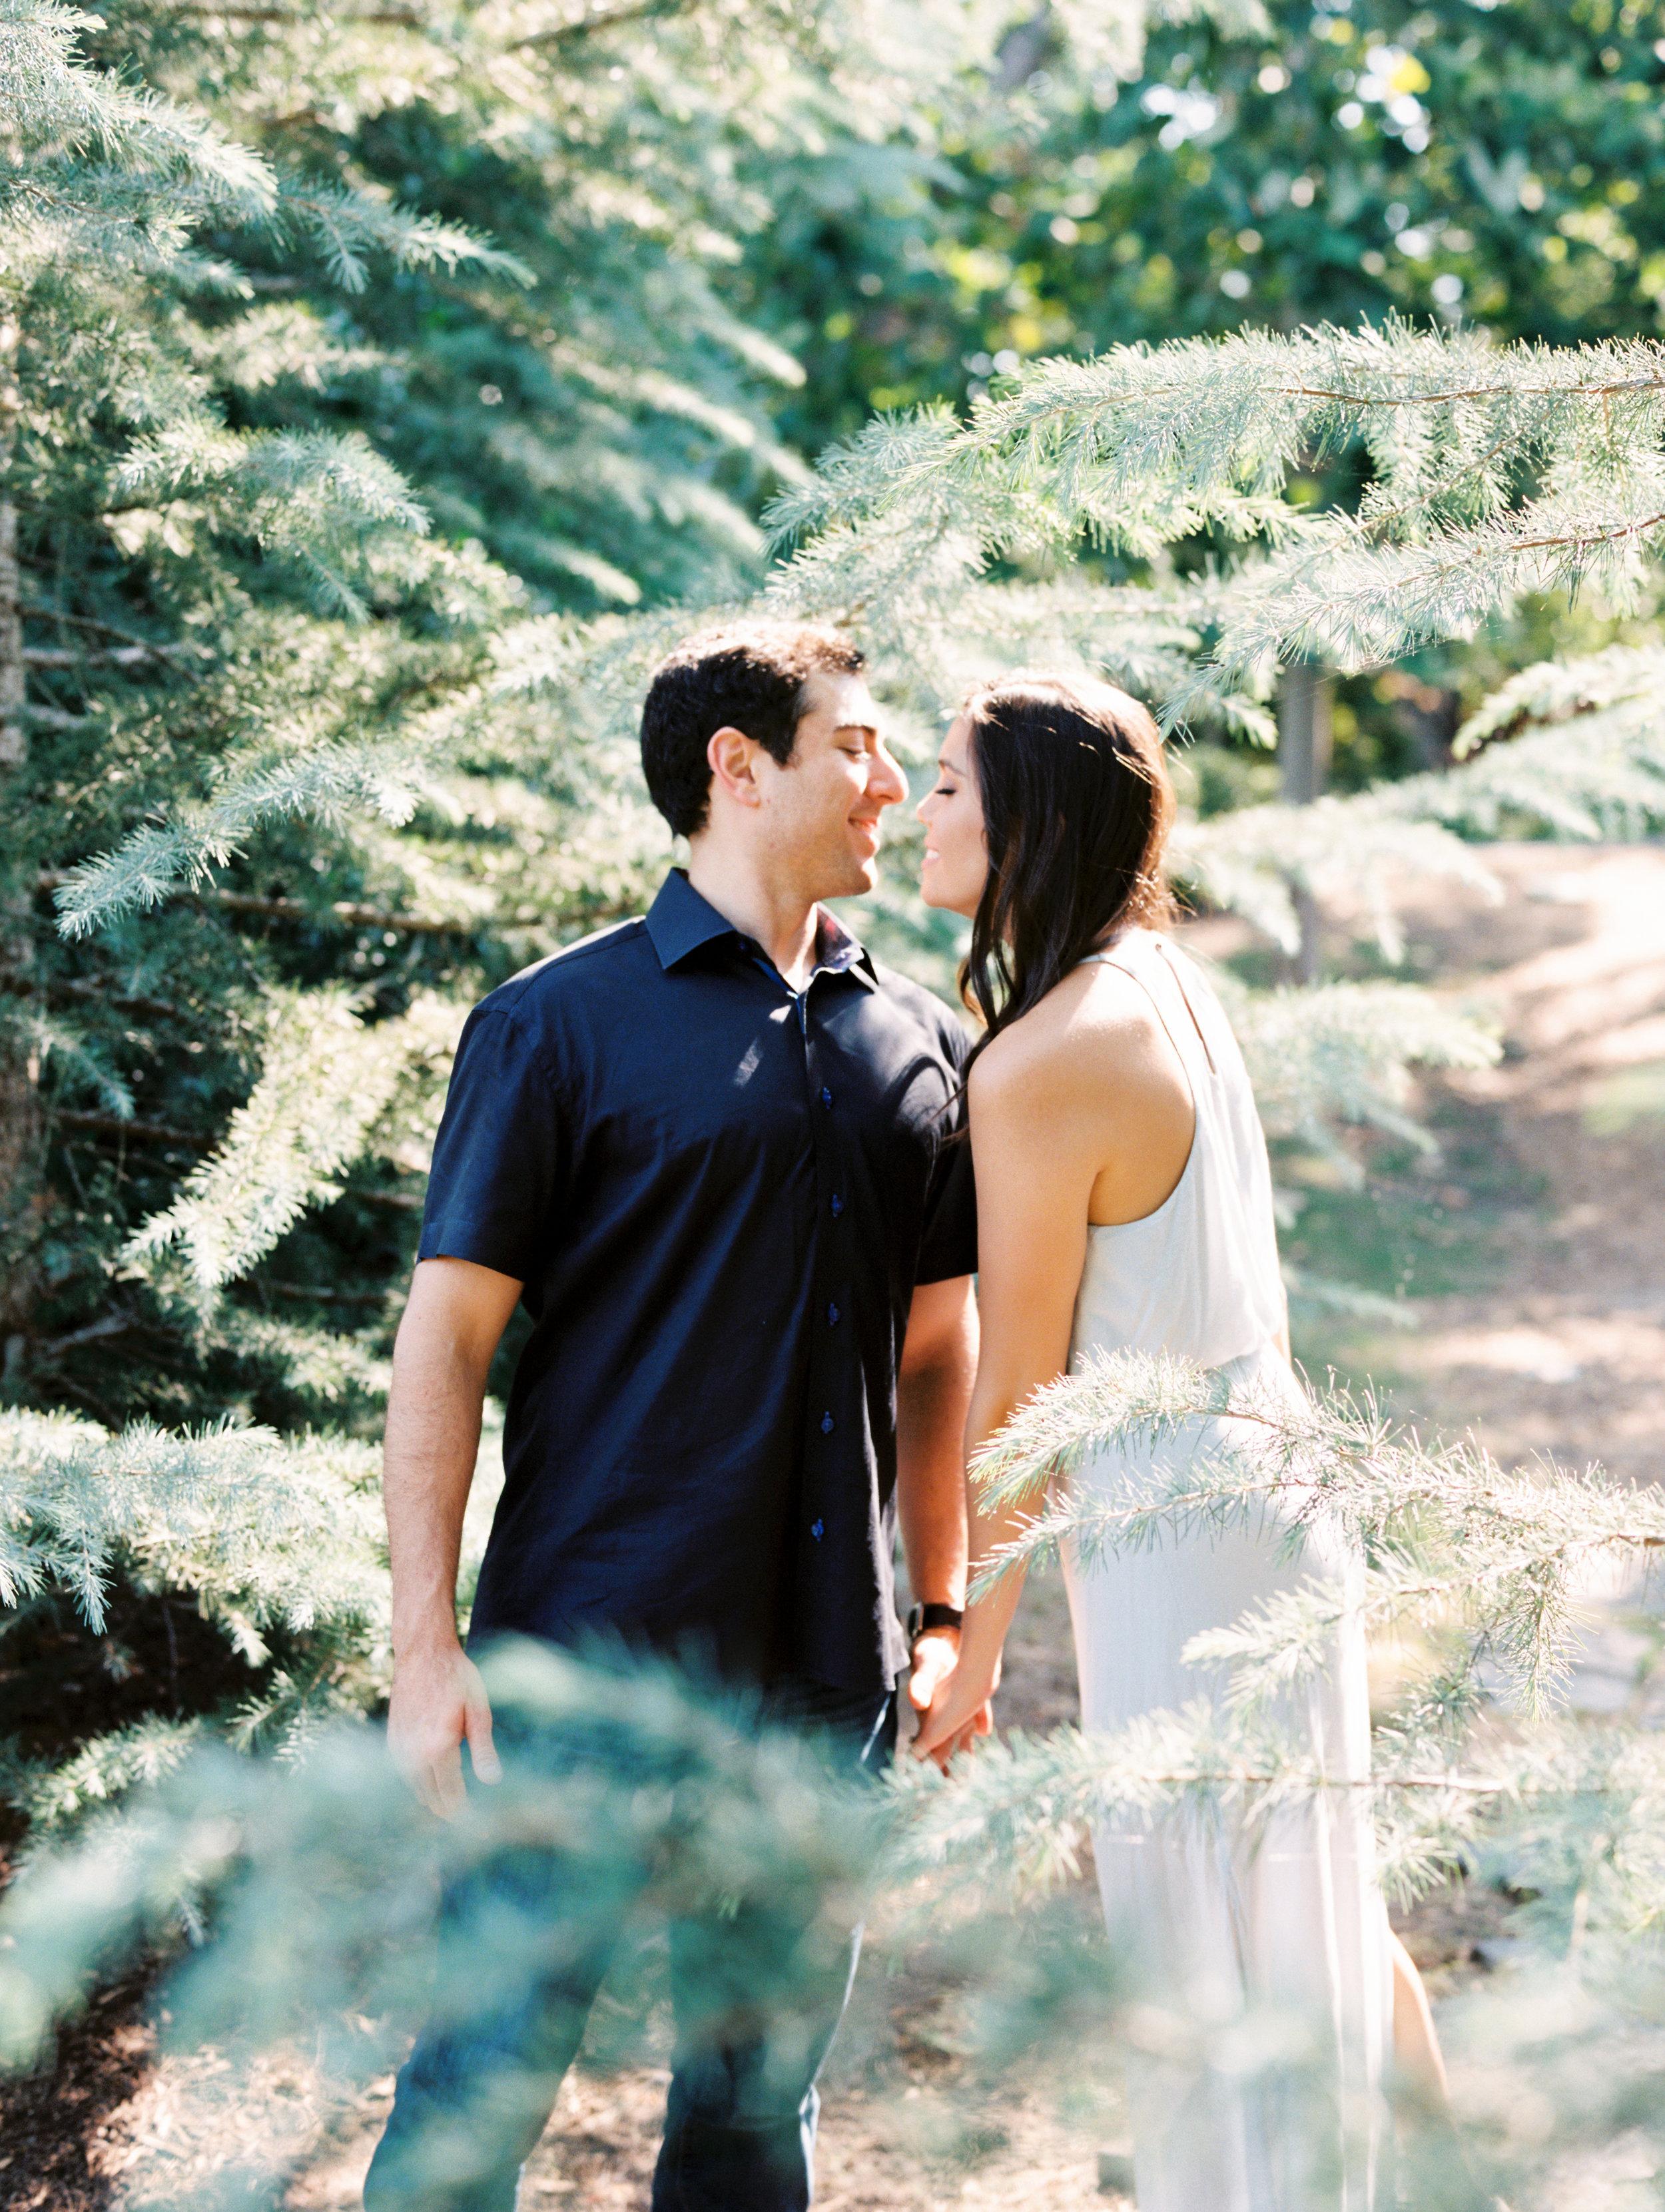 dallas-arboretum-botanical-garden-engagements-ar-photography-lindsey-vance-153.jpg